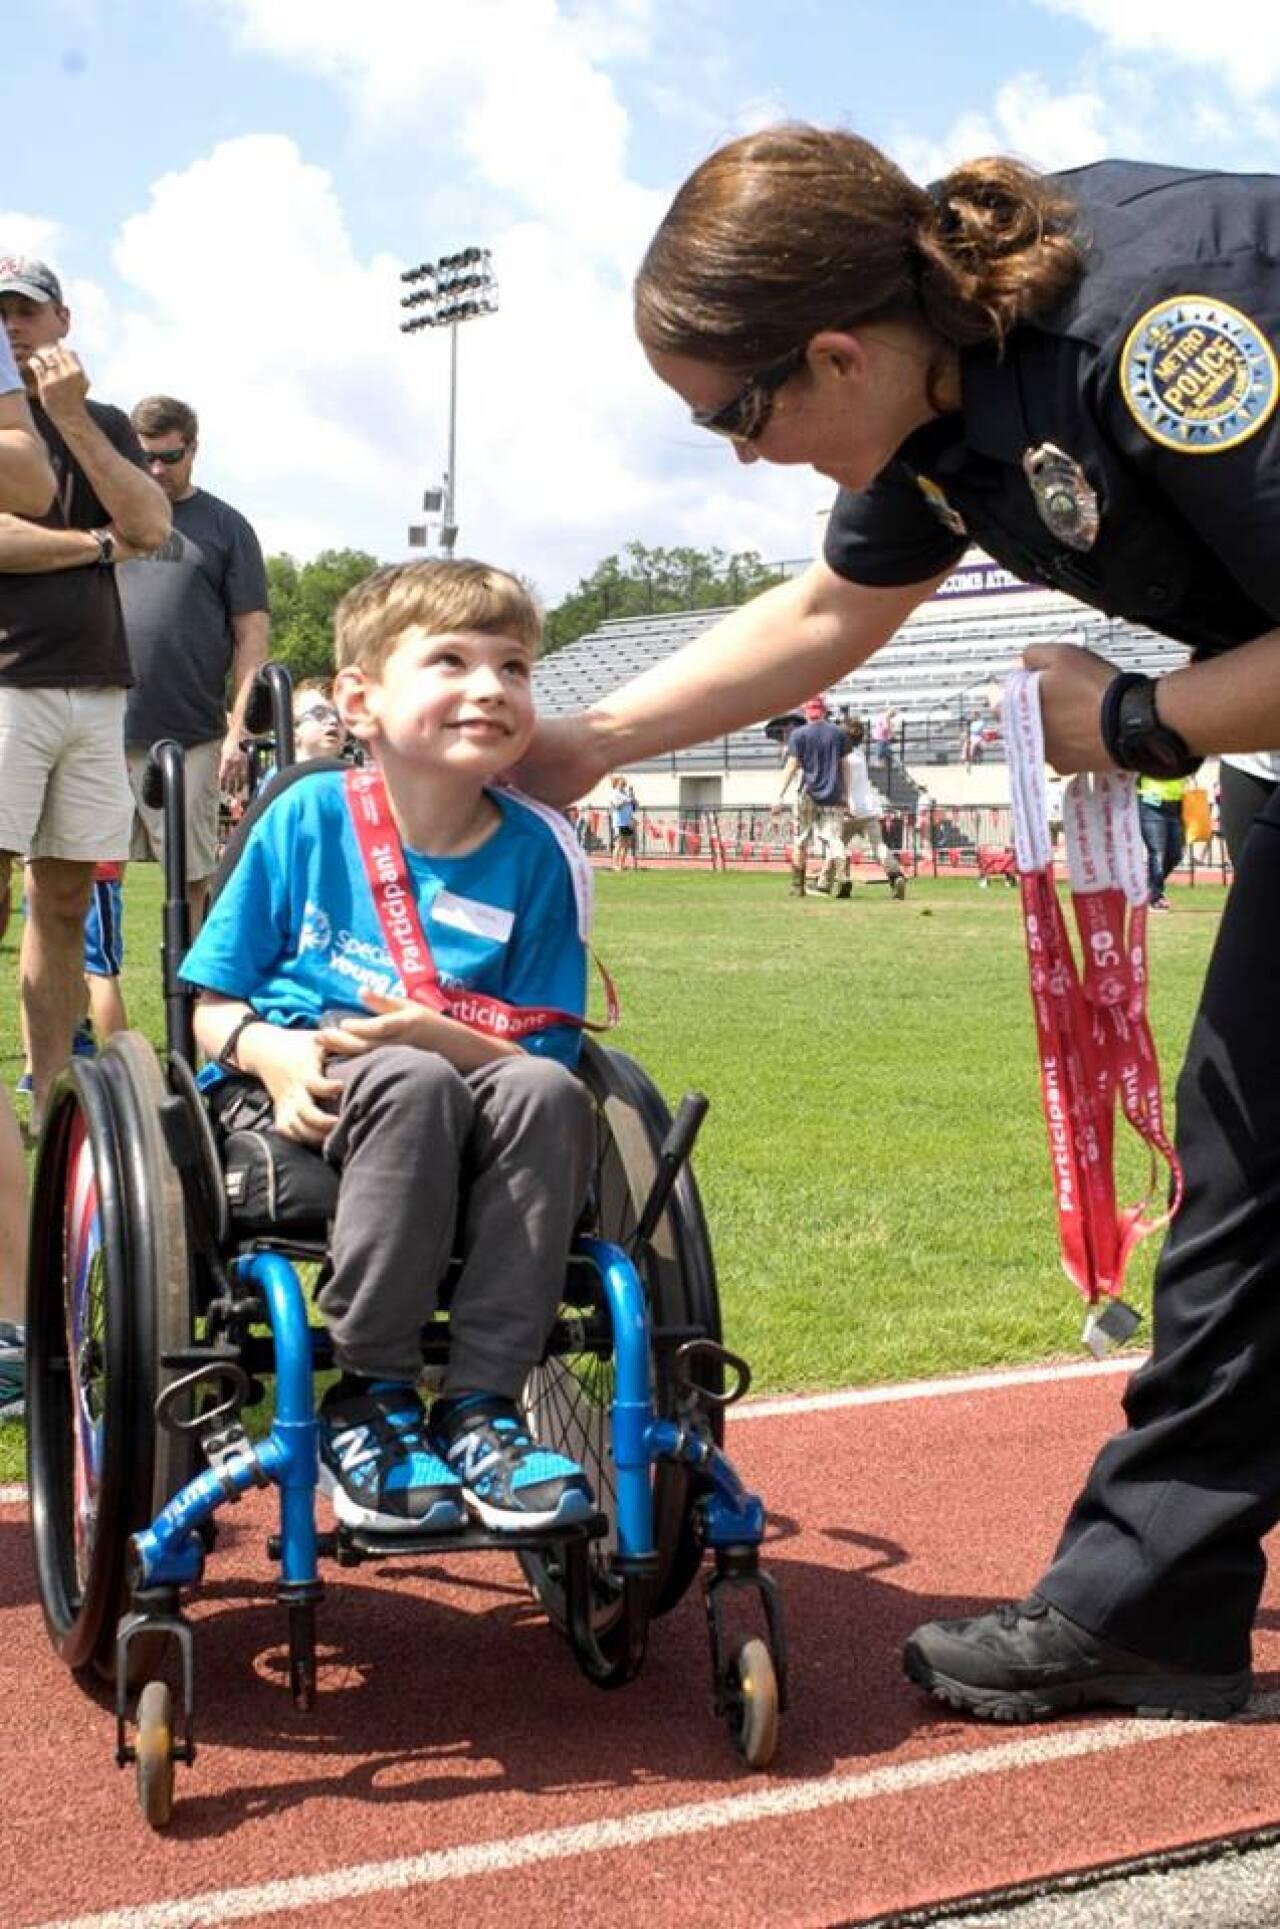 Torch Run Awards Summer Games Young Athletes